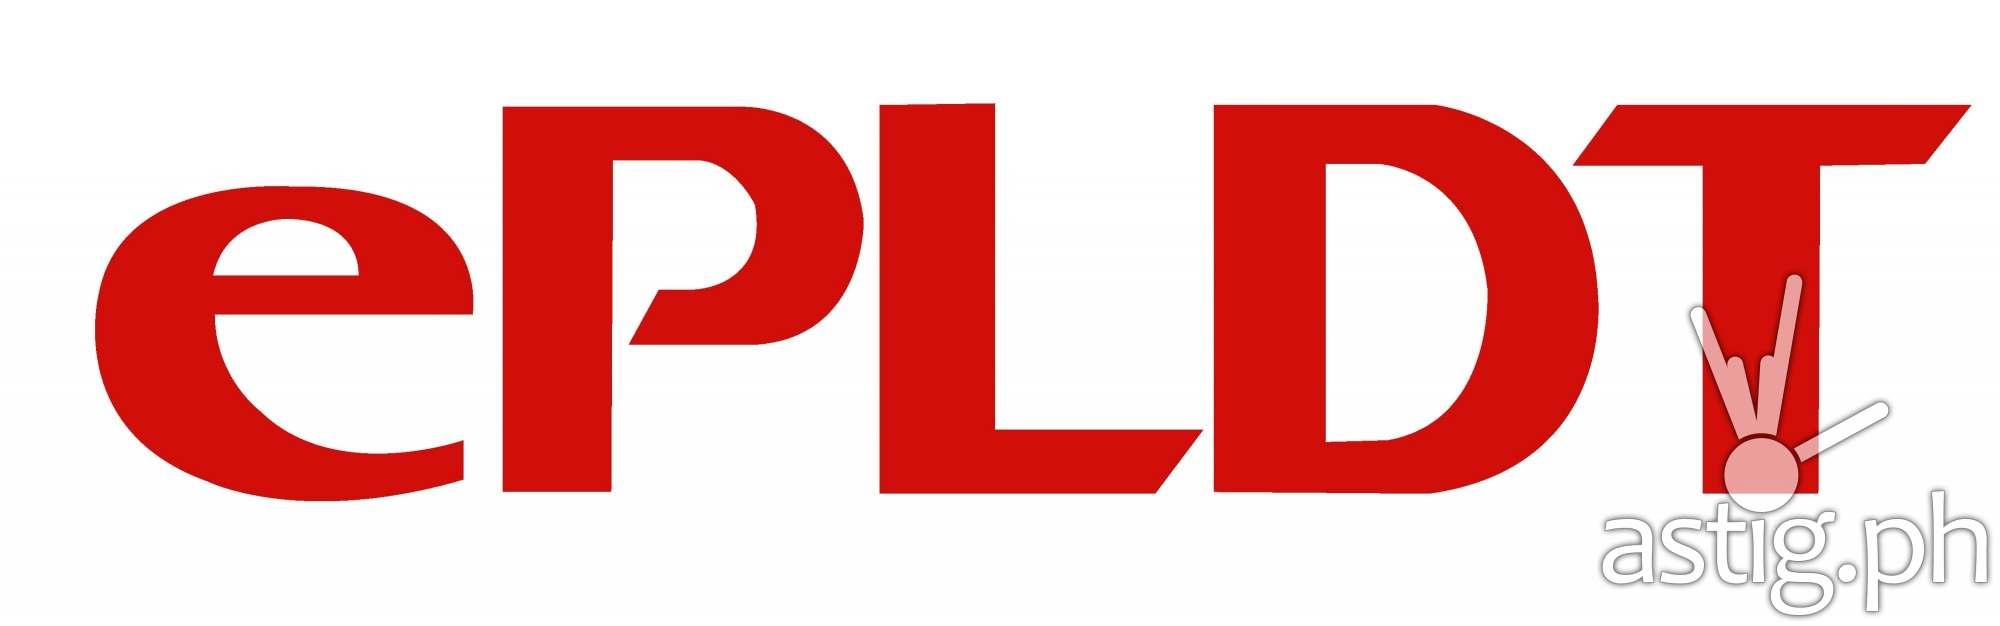 ePLDT new pantone